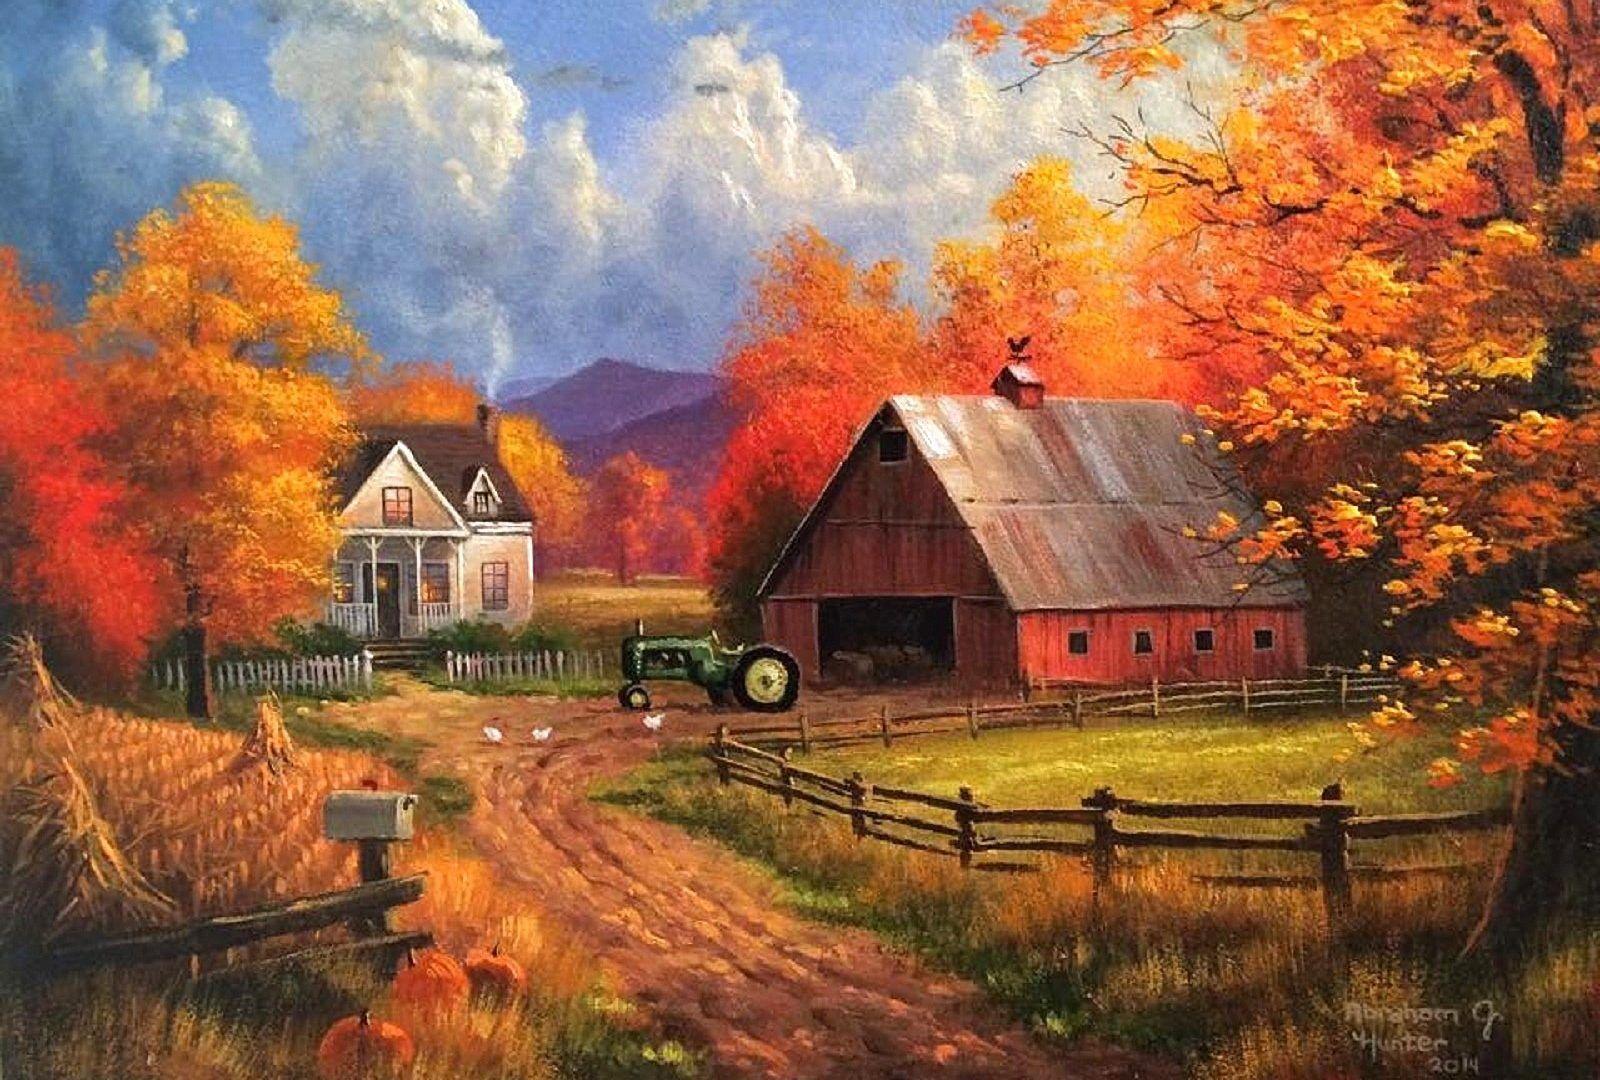 Farms Autumn Farms Paintings Colors Trees Nature Fall Landscapes Autumn Landscape Farm Paintings Autumn Painting